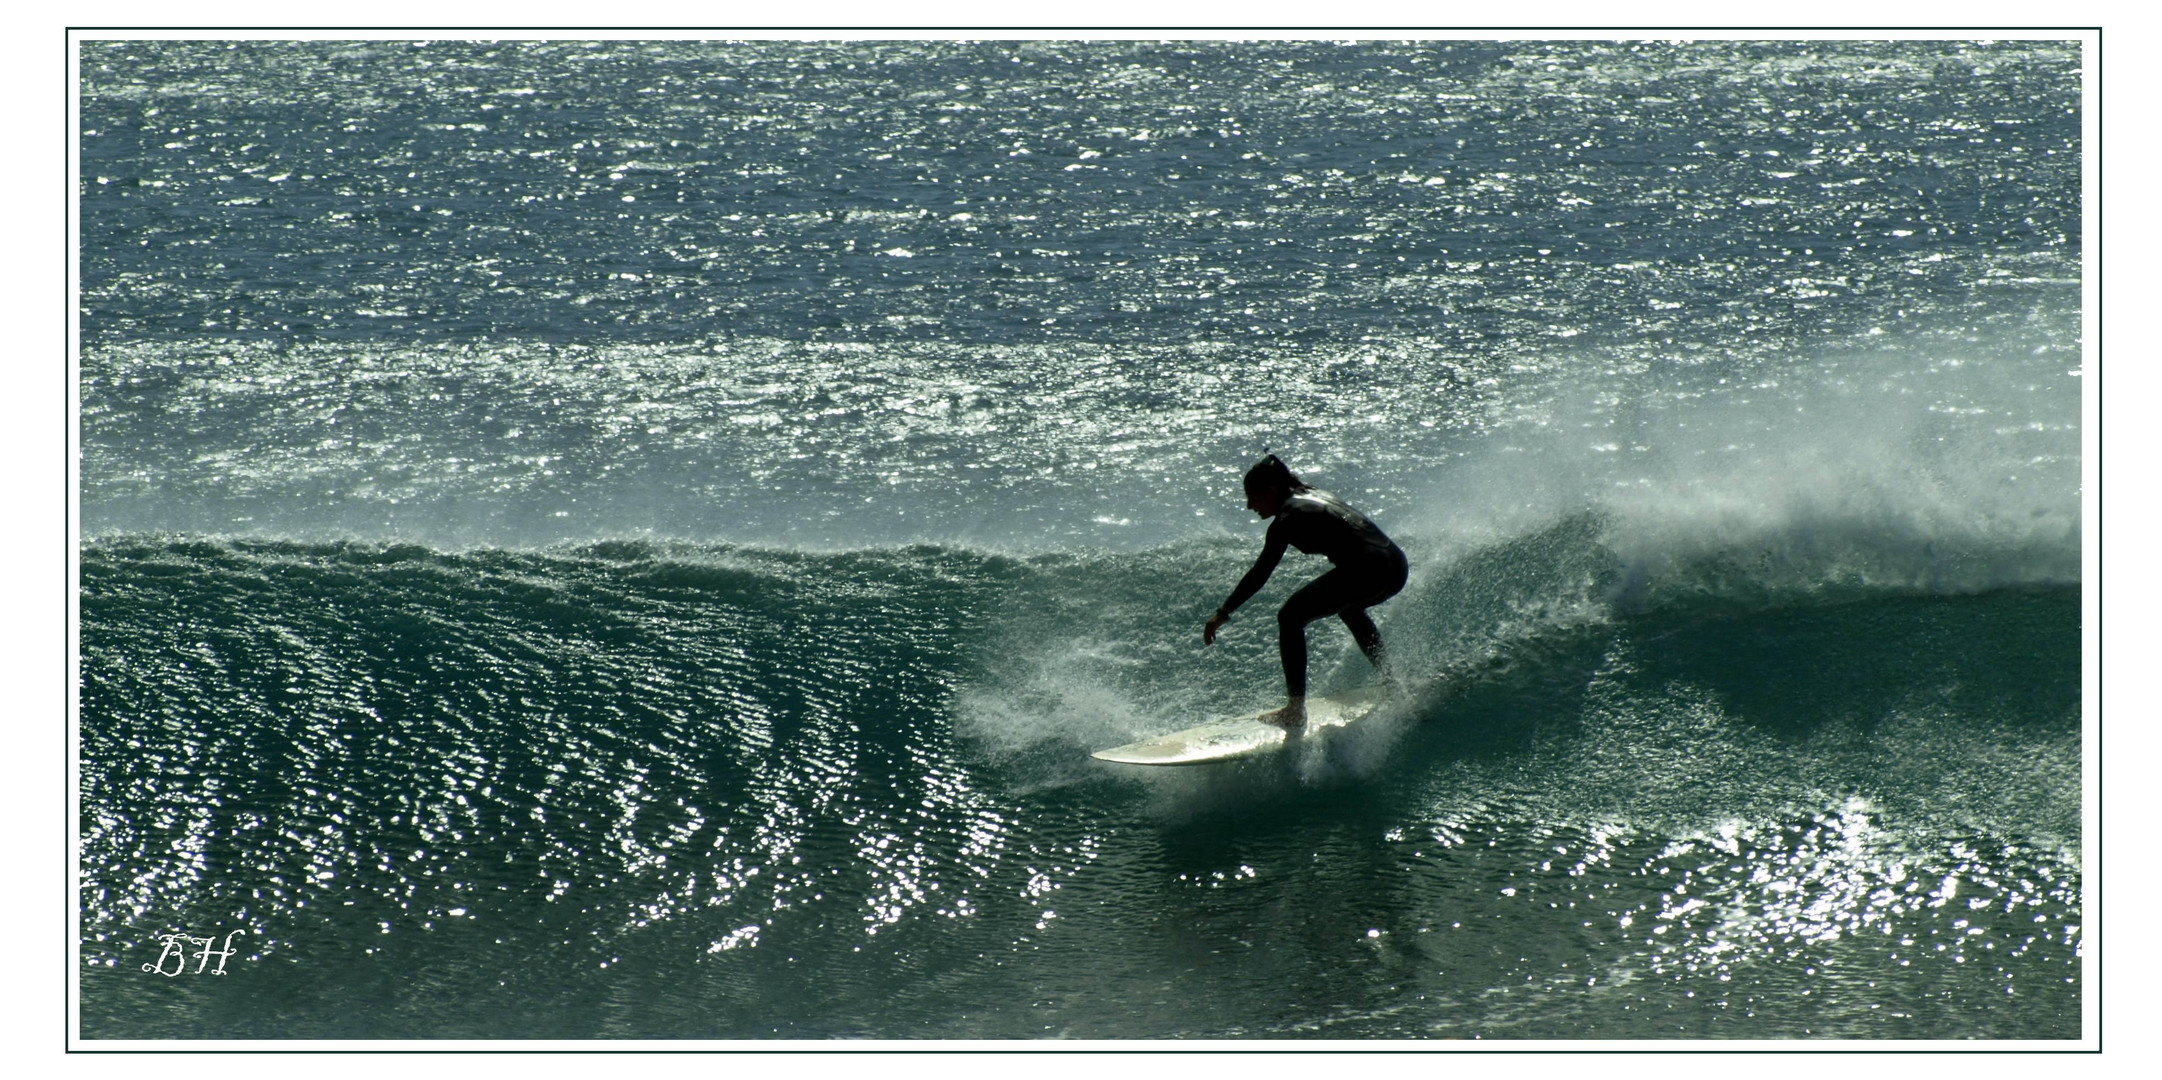 SURFING - FUERTEVENTURA (2)